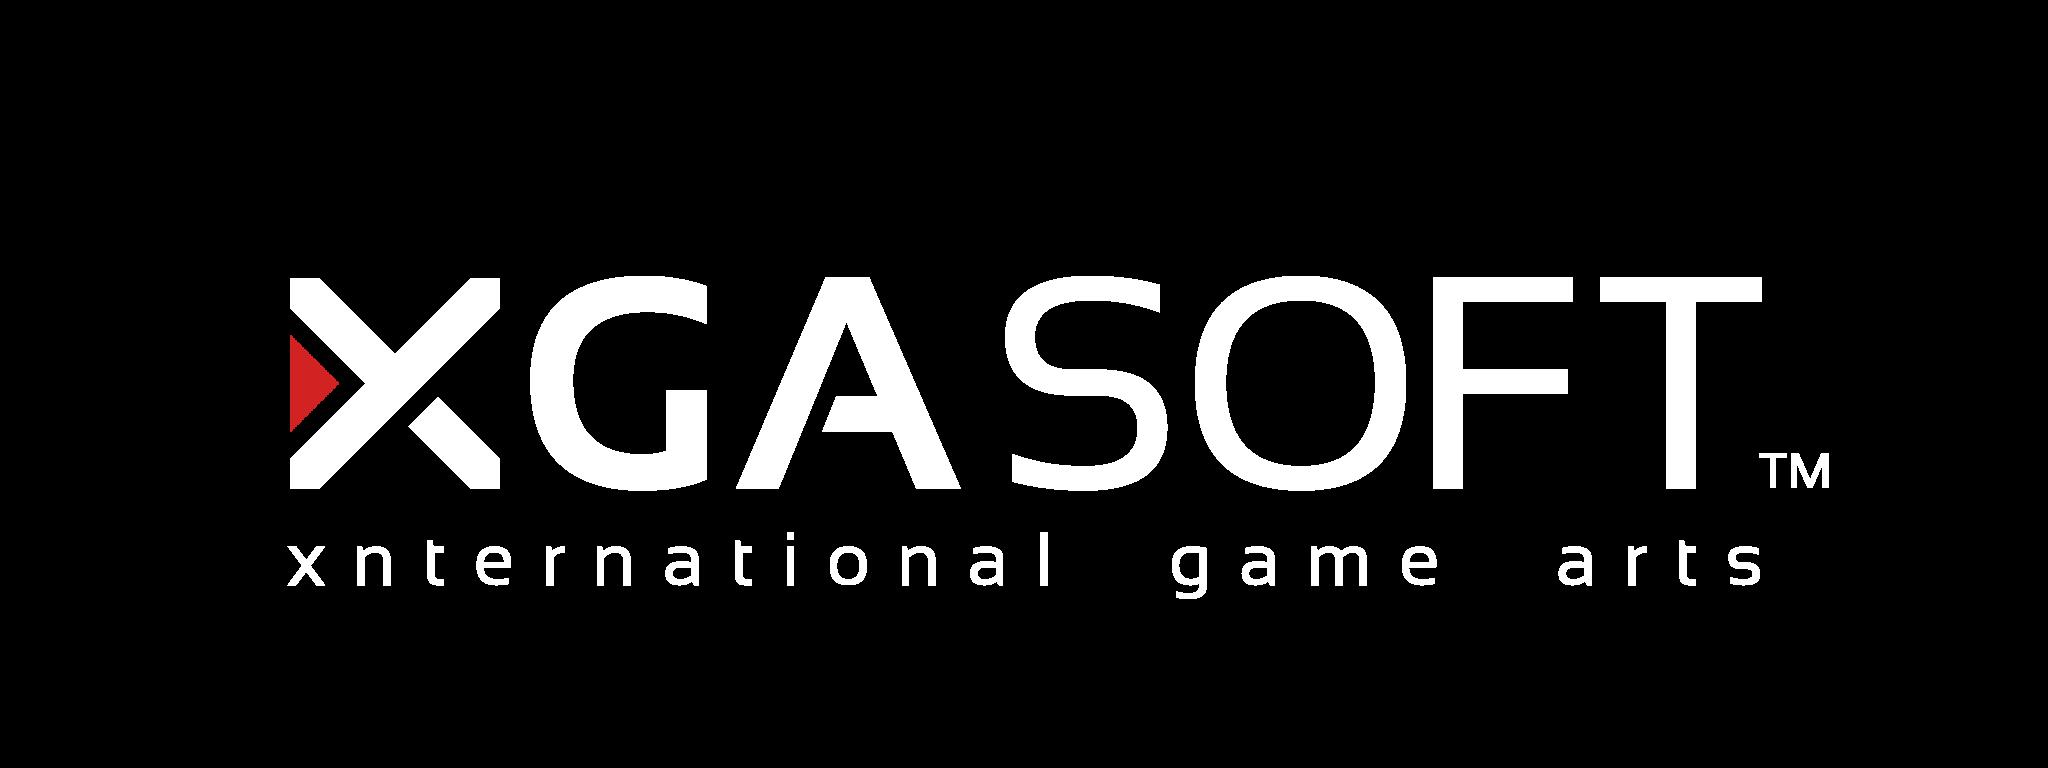 XGASOFT